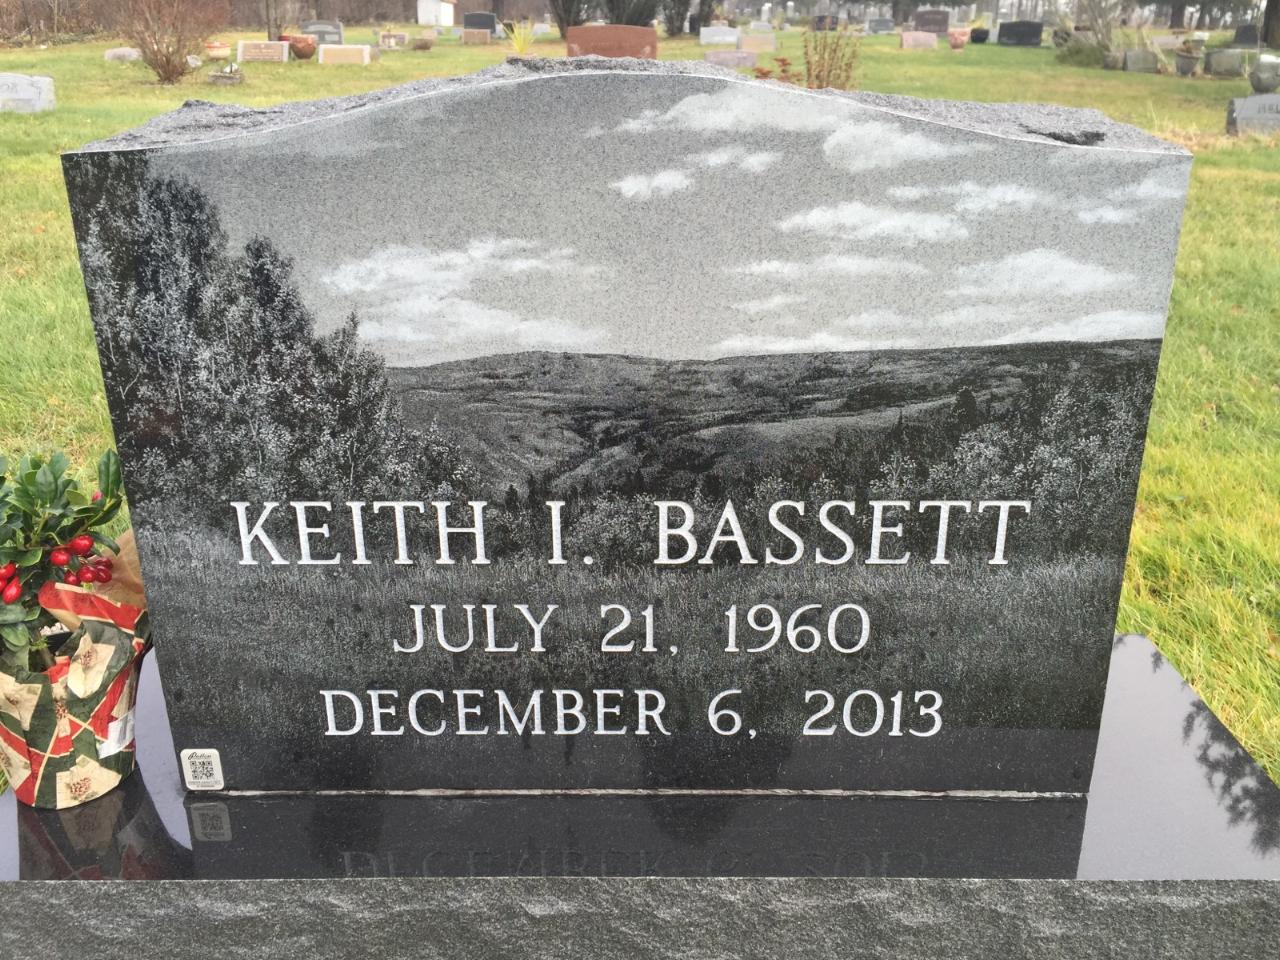 Basset Upright